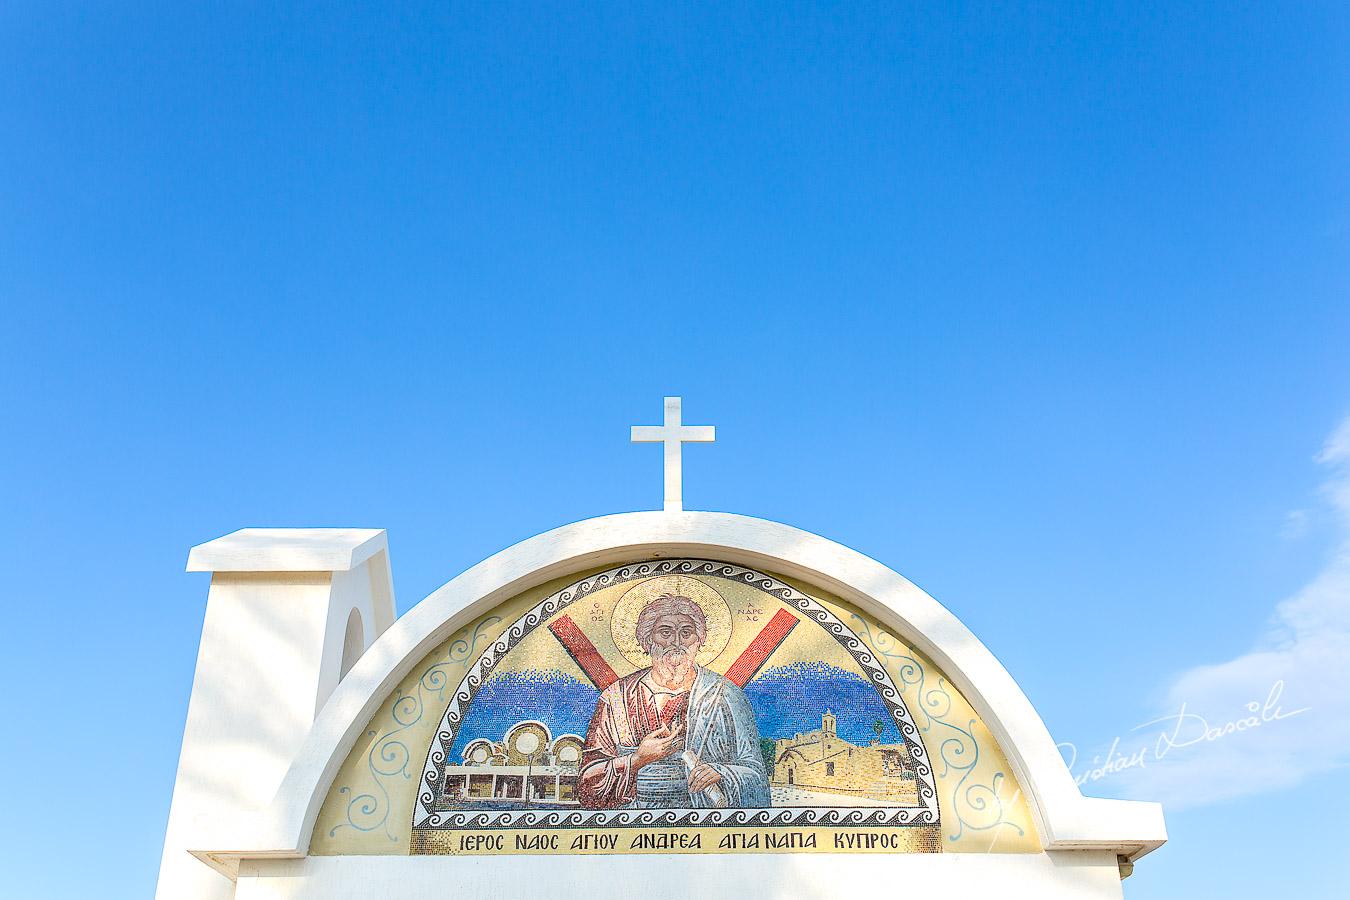 Beautiful church captured during a wedding in Ayia Napa, Cyprus by Cristian Dascalu.